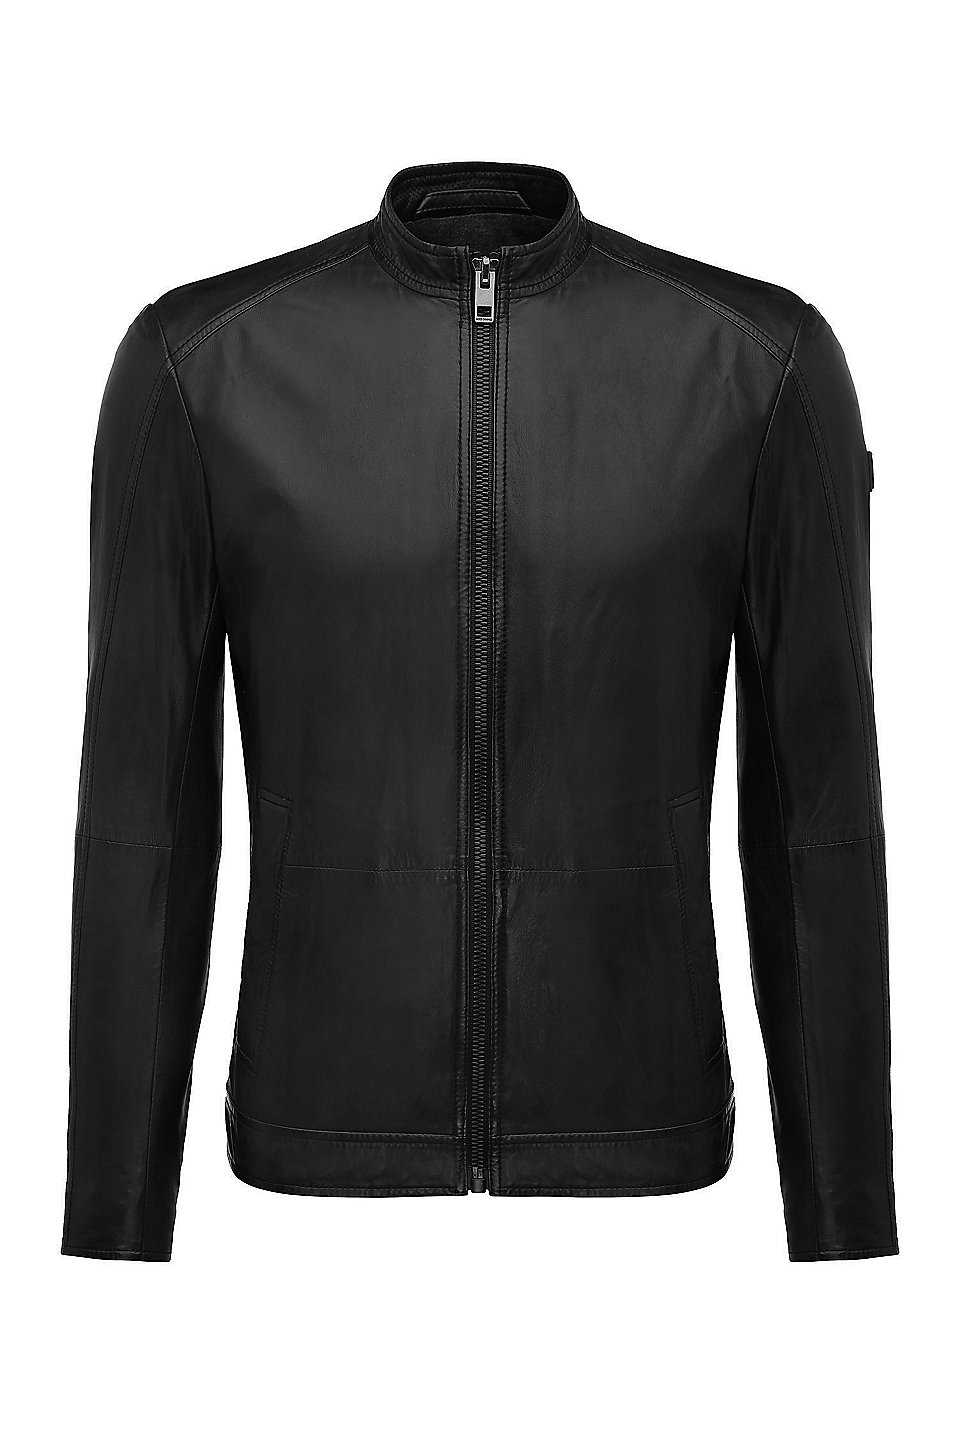 Mens quilted jacket next -  Joker Slim Fit Nappa Leather Jacket Black